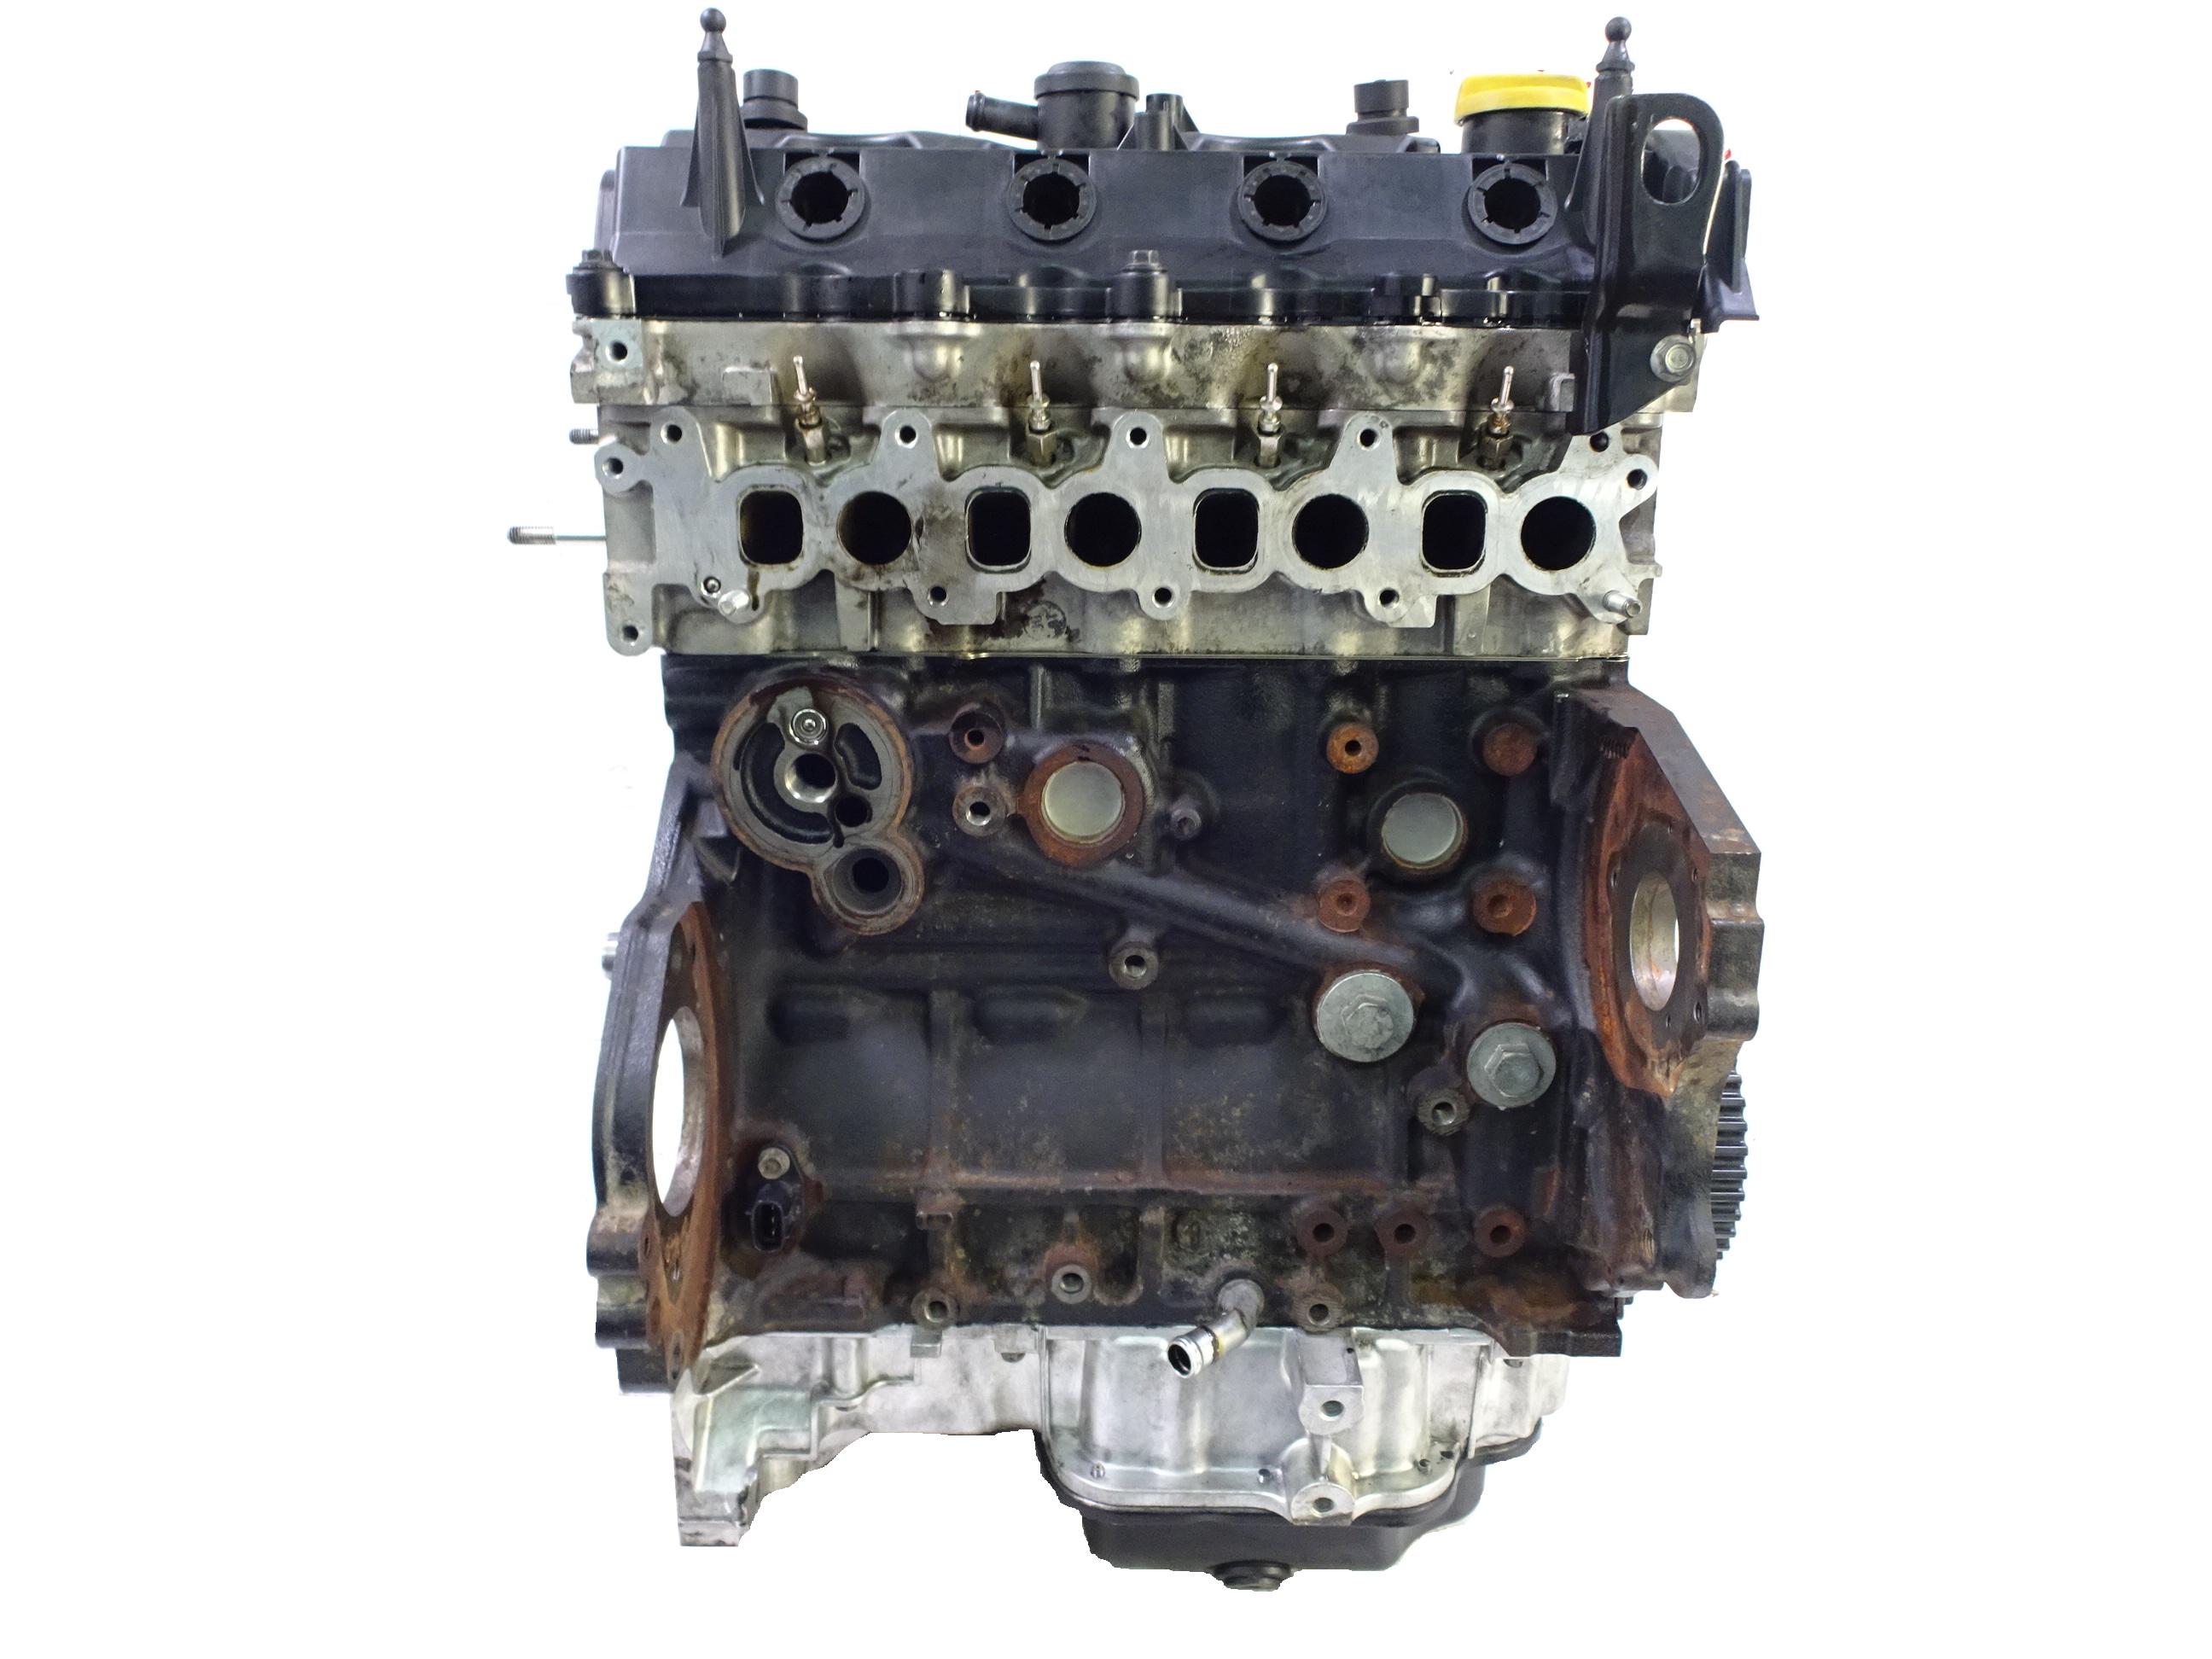 Motor 2010 Opel Corsa 1,7 CDTI Z17DTR Pleuellager Dichtung NEU Kopf geplant